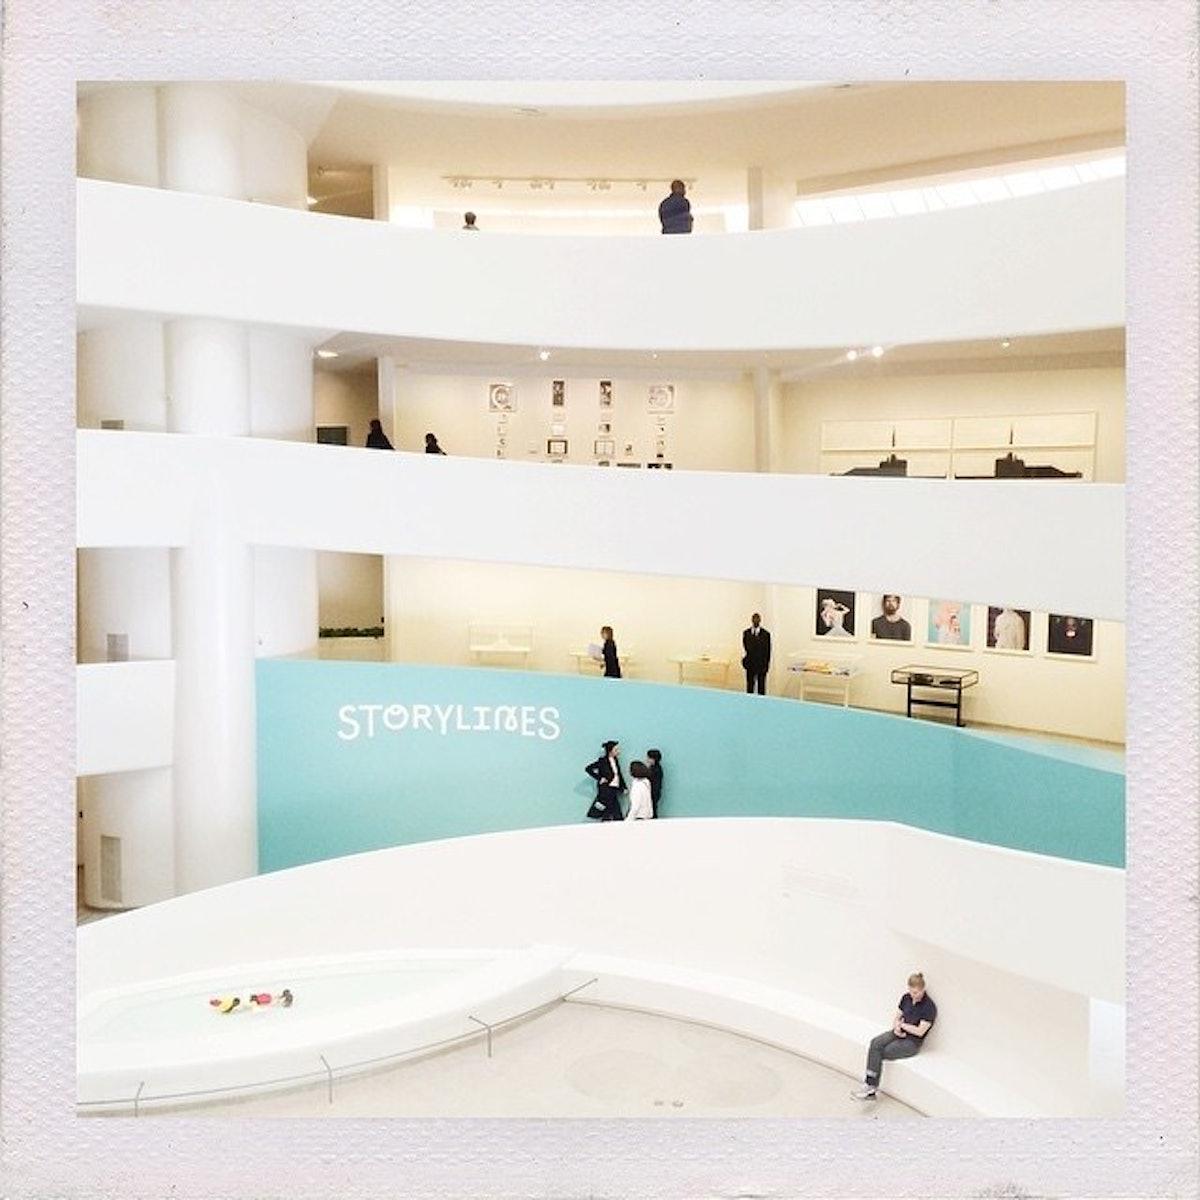 Guggenheim Storylines